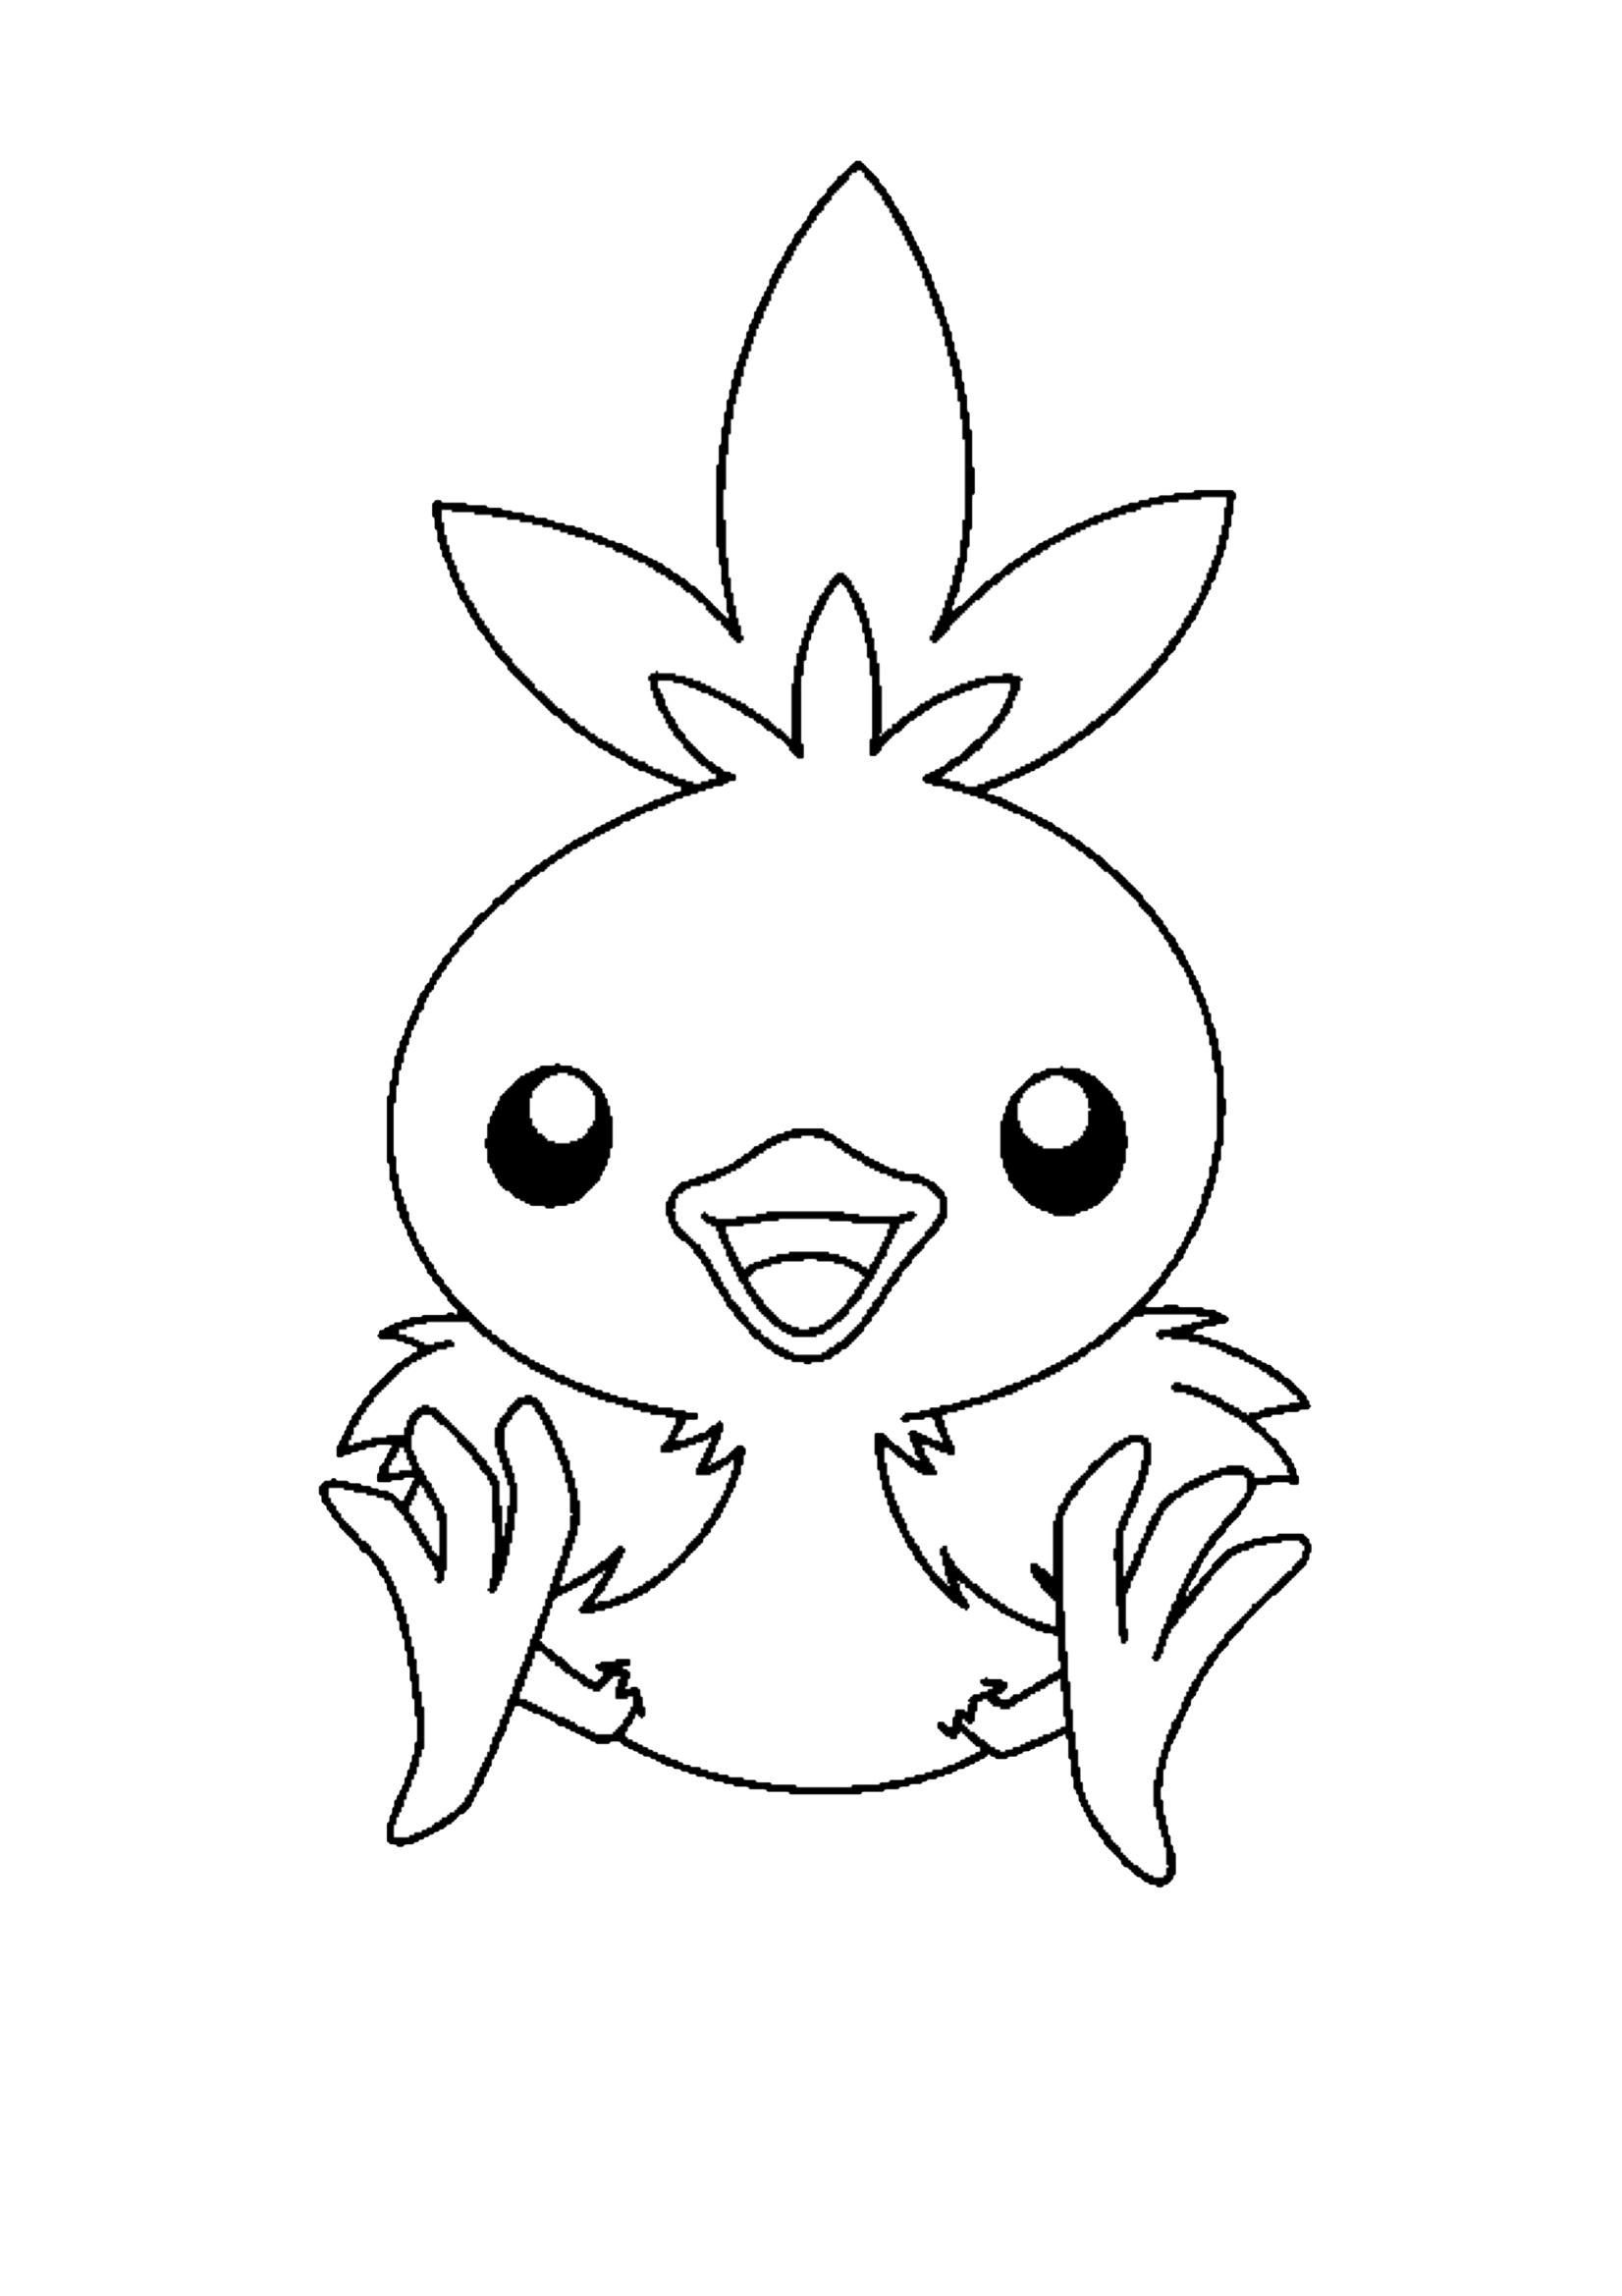 Gratis kleurplaat Pokemon